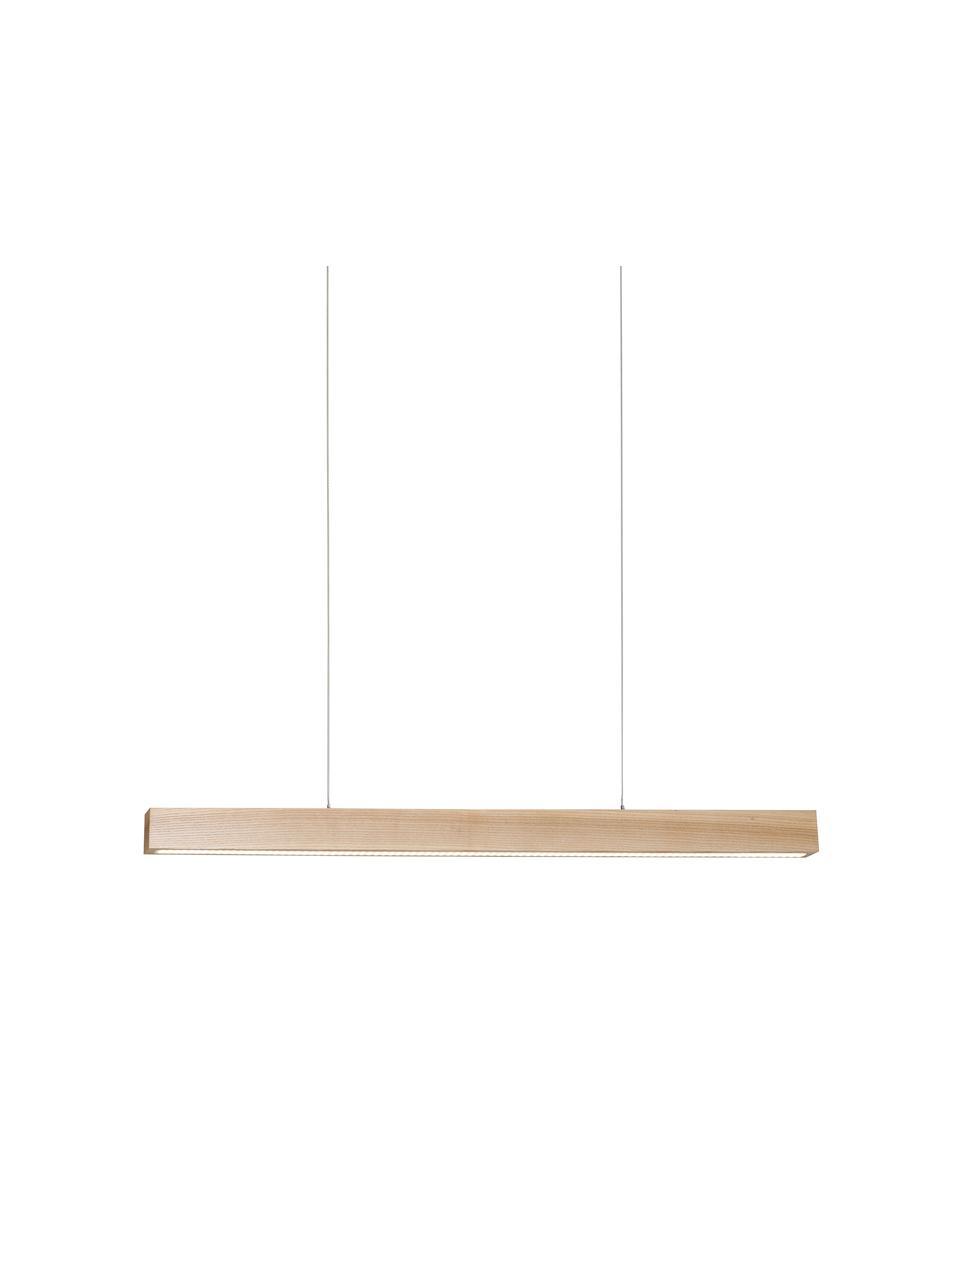 Große LED-Pendelleuchte Timber aus Holz, Lampenschirm: Holz, Baldachin: Holz, Holz, B 65 x T 9 cm